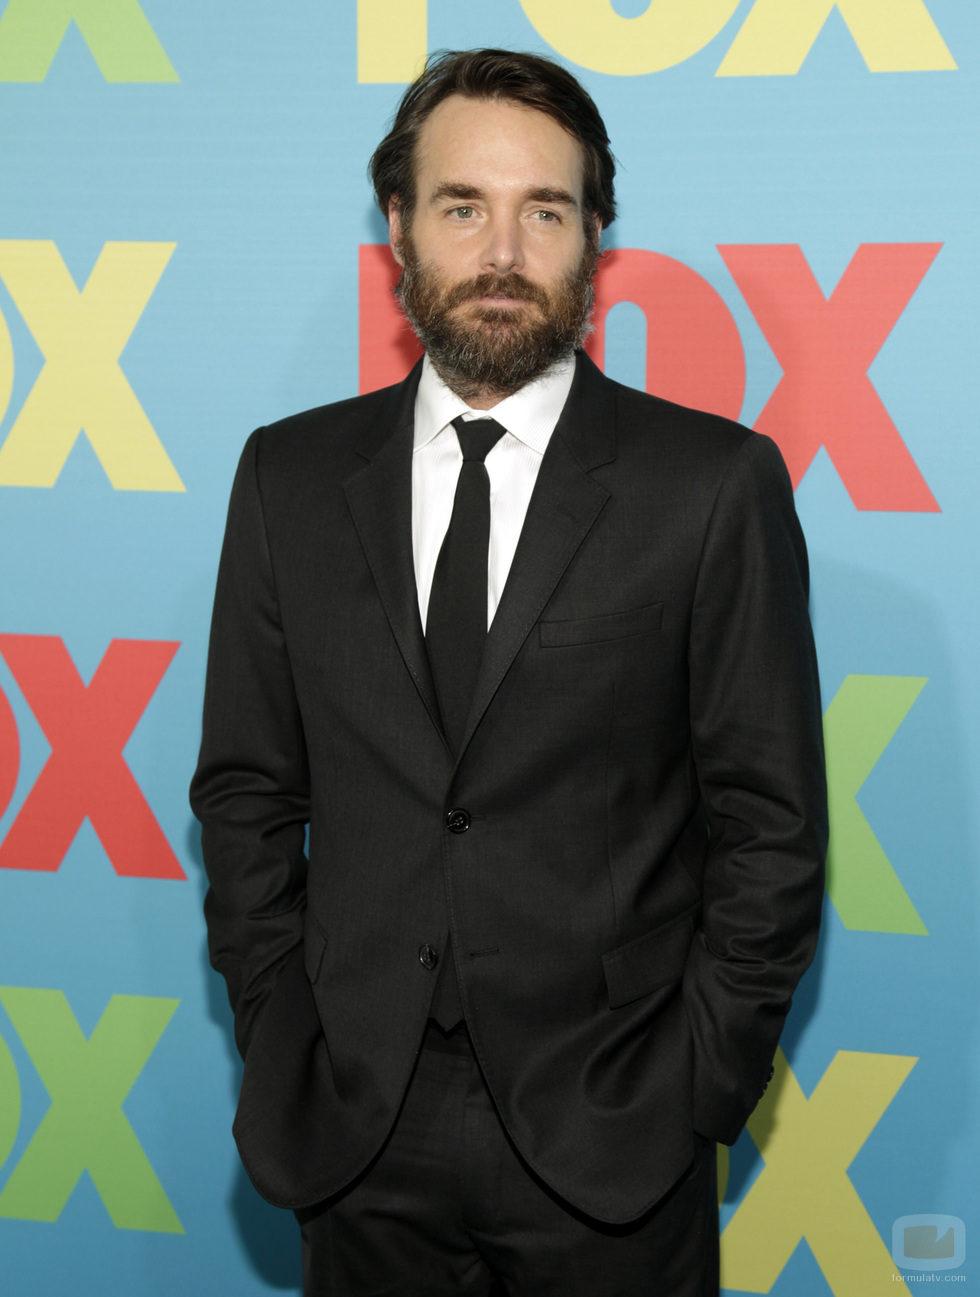 Will Forte presenta 'Last Man on Earth' en los Upfronts 2014 de Fox